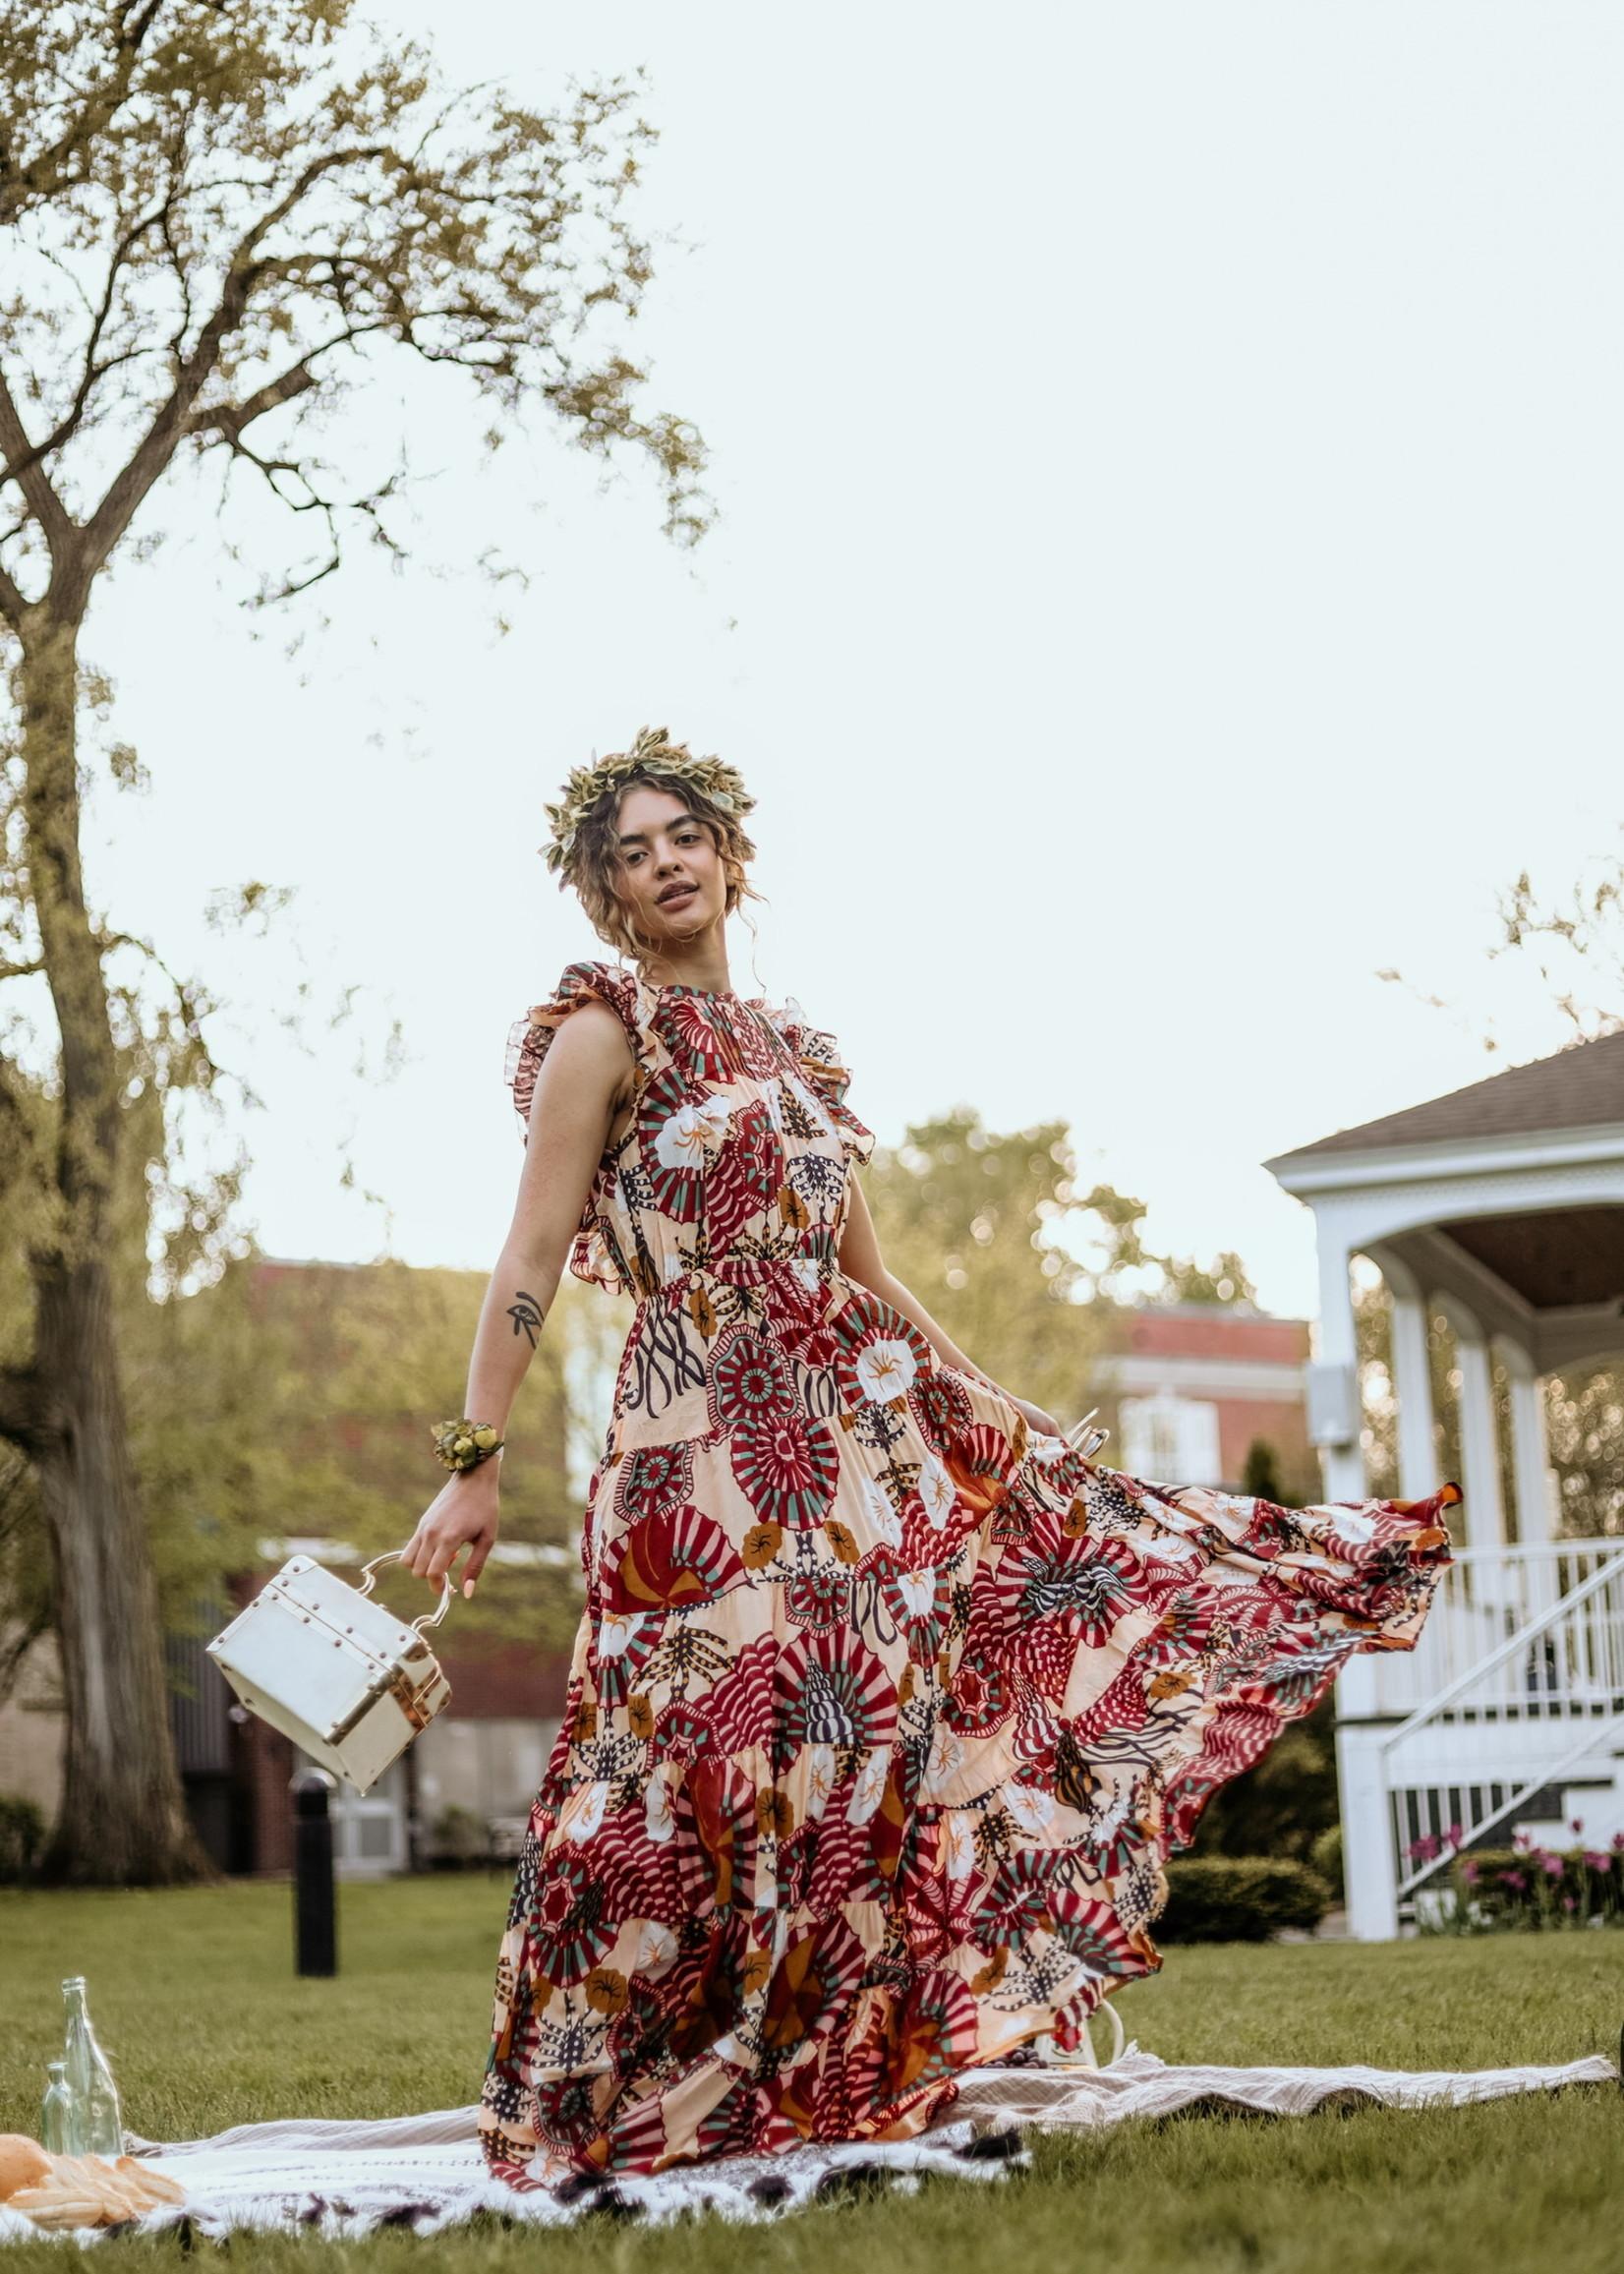 Scotch & Soda Scotch & Soda Printed Cotton Blend Summer Dress